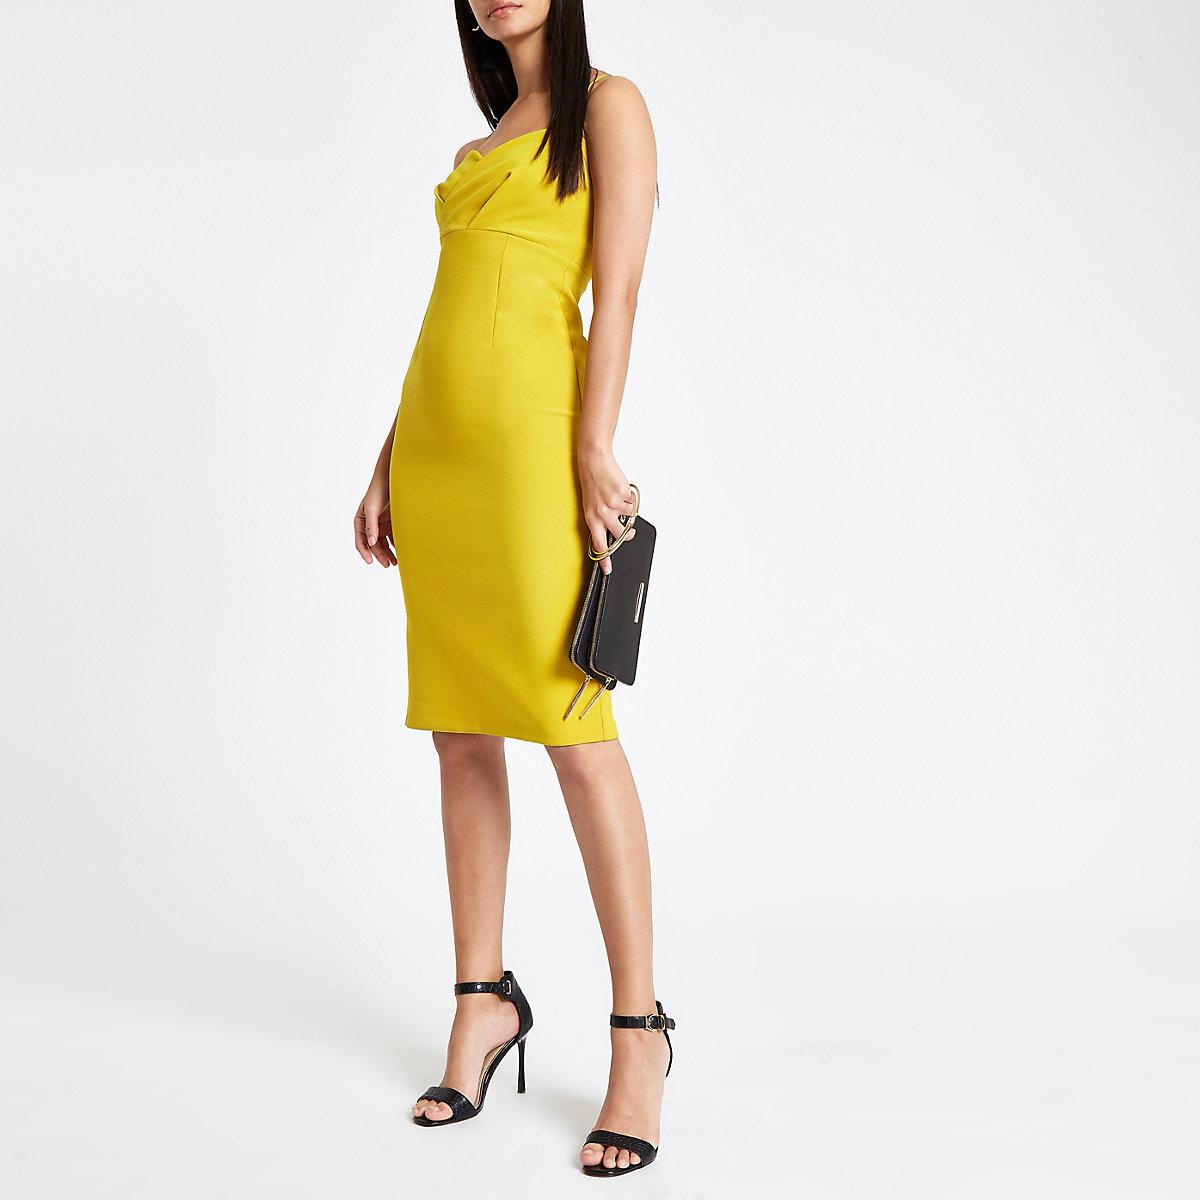 Yellow tulip style bodycon midi dress